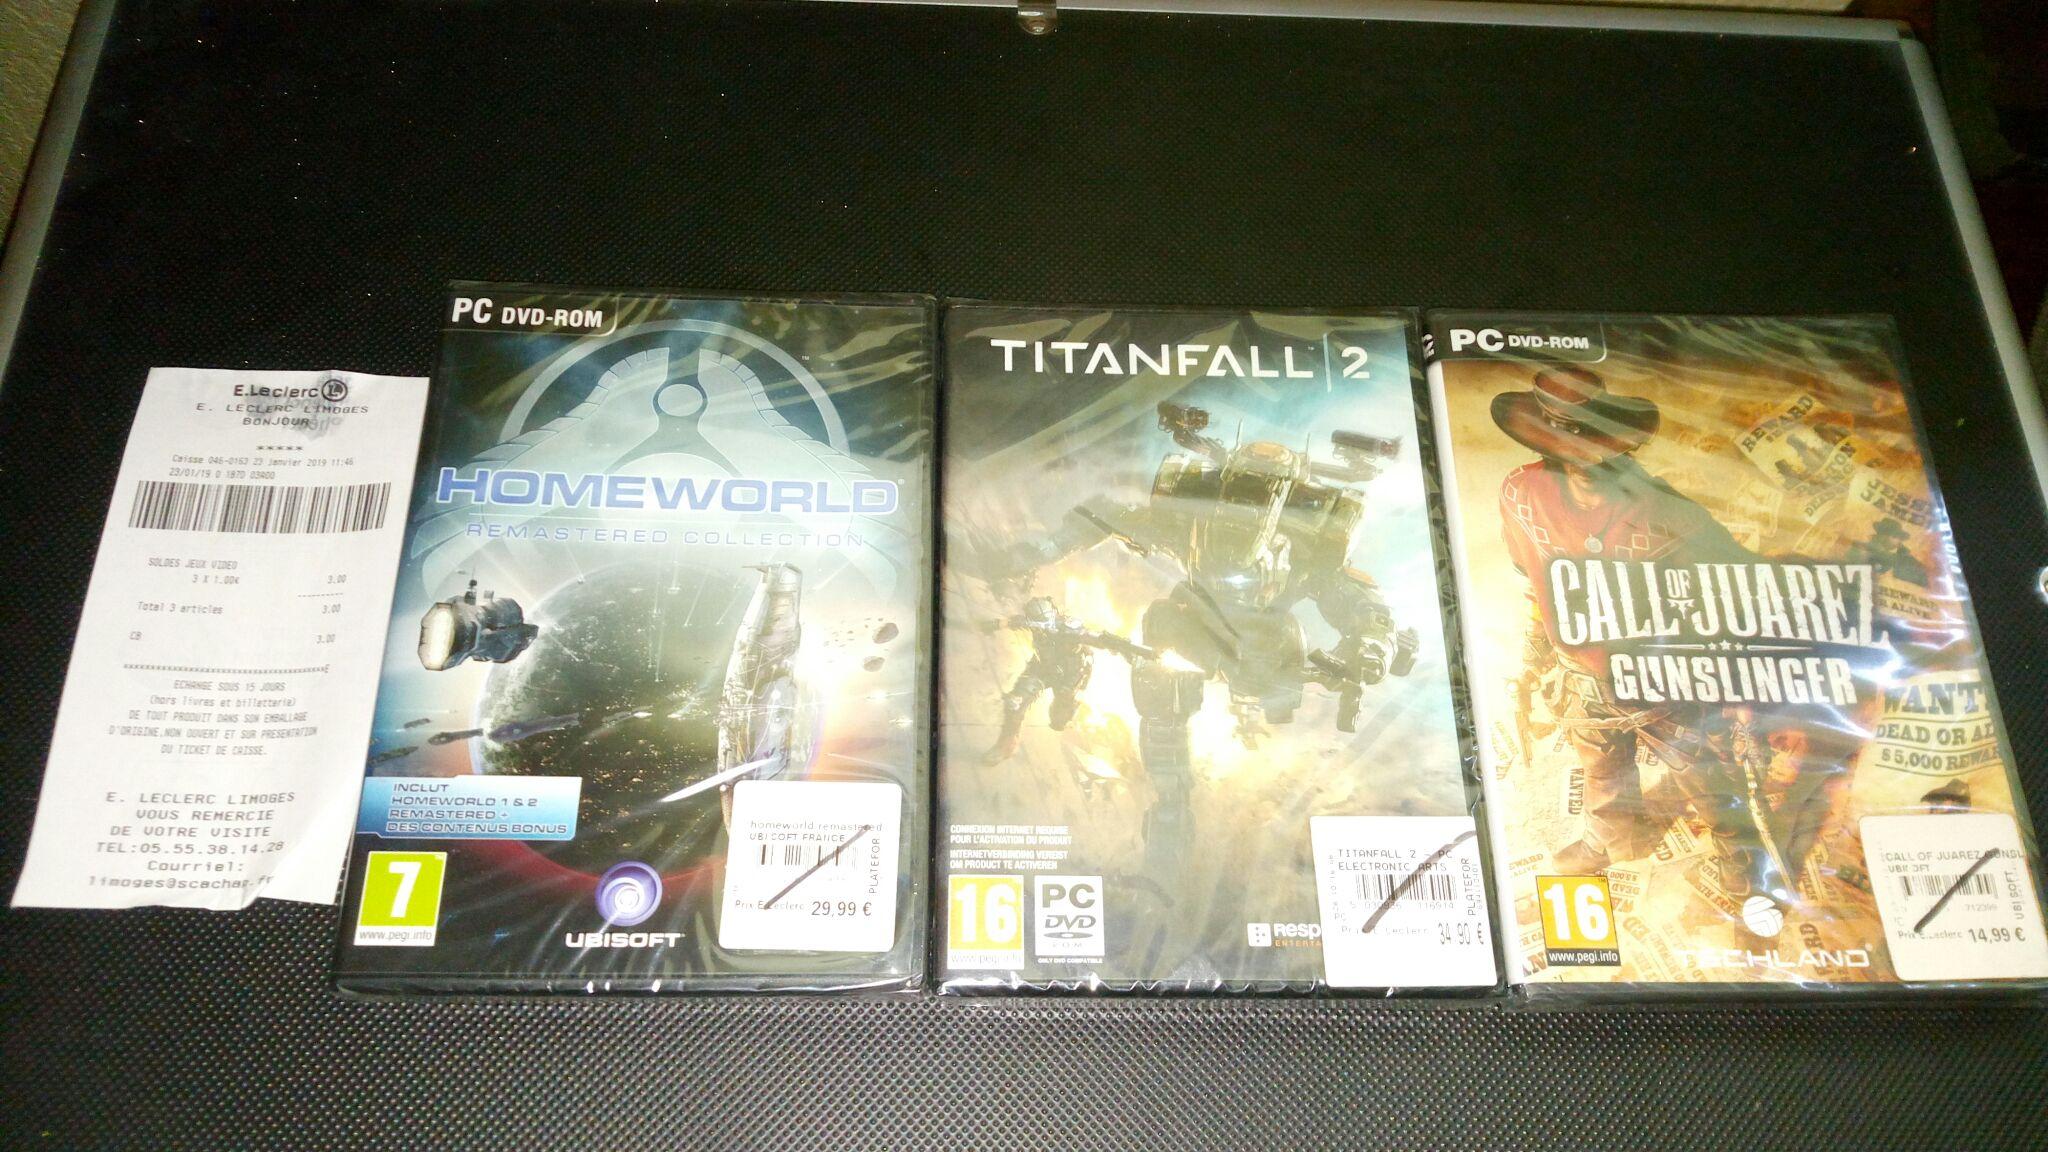 Call of Juarez: Gunslinger, Homeworld ou Titanfall 2 sur PC à 1€ - Limoges (87)